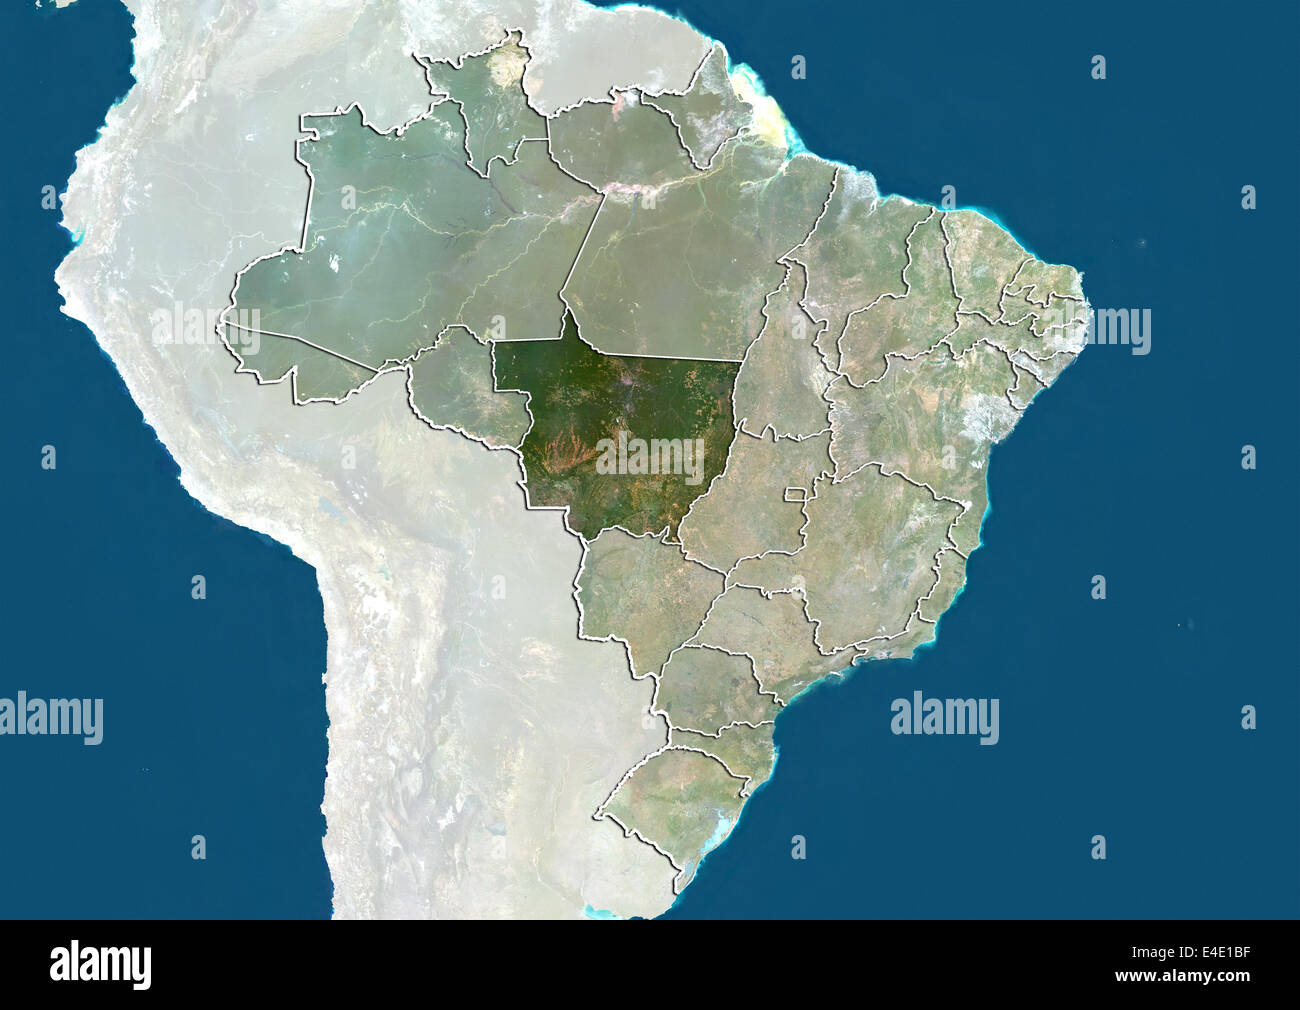 Brazil and the State of Mato Grosso, True Colour Satellite Image Stock Photo